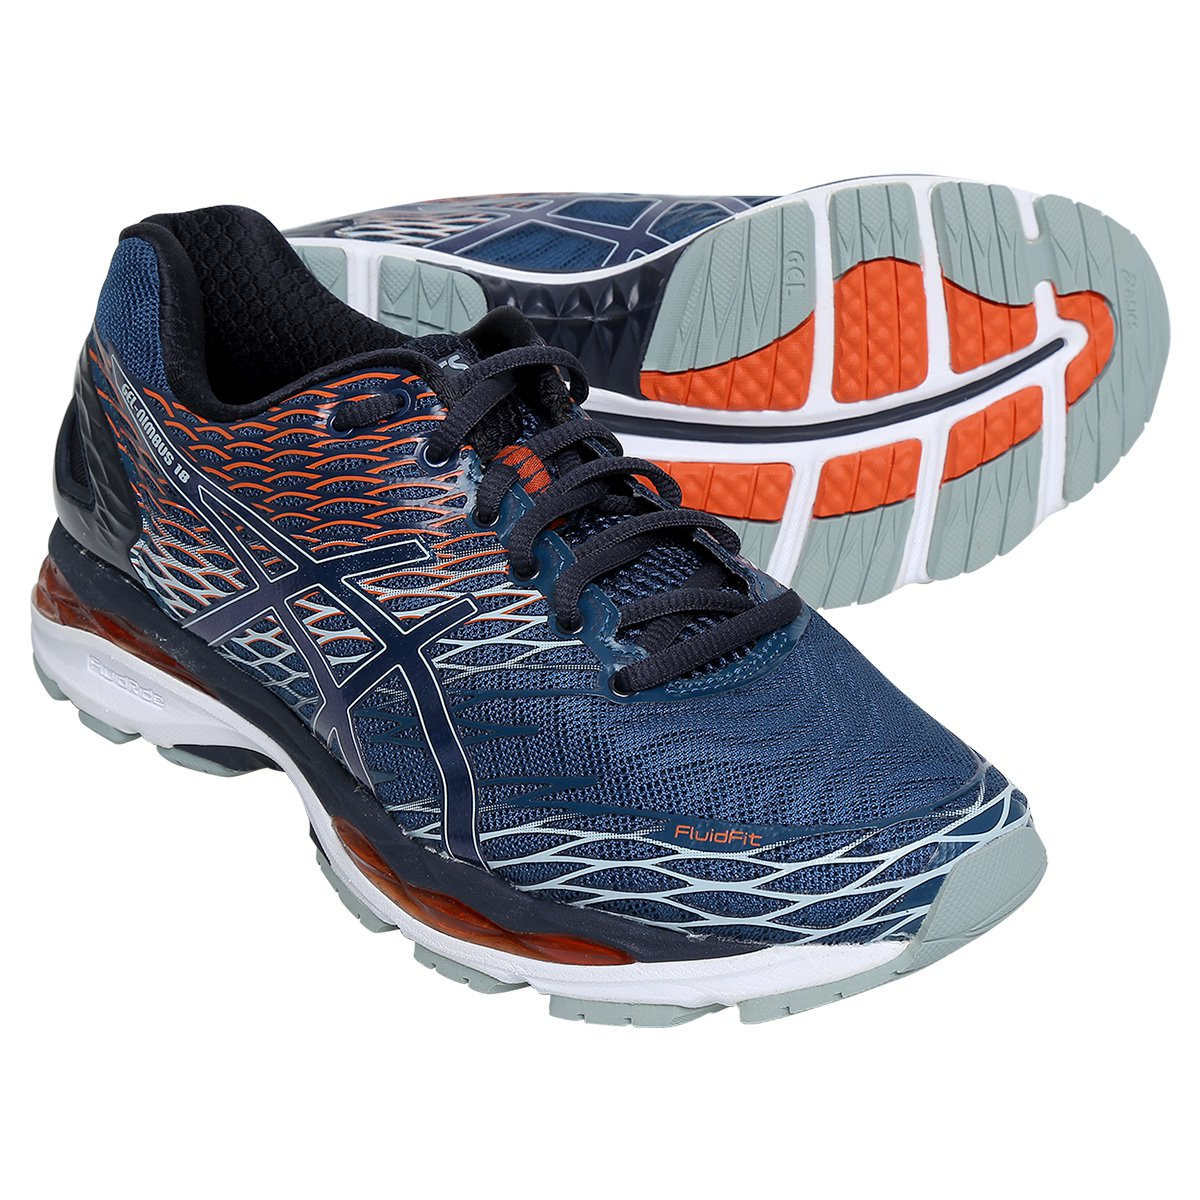 a0441612817 Tênis Asics Gel Nimbus 18 Masculino - Compre Agora Netshoes ... 194ed1ef50086